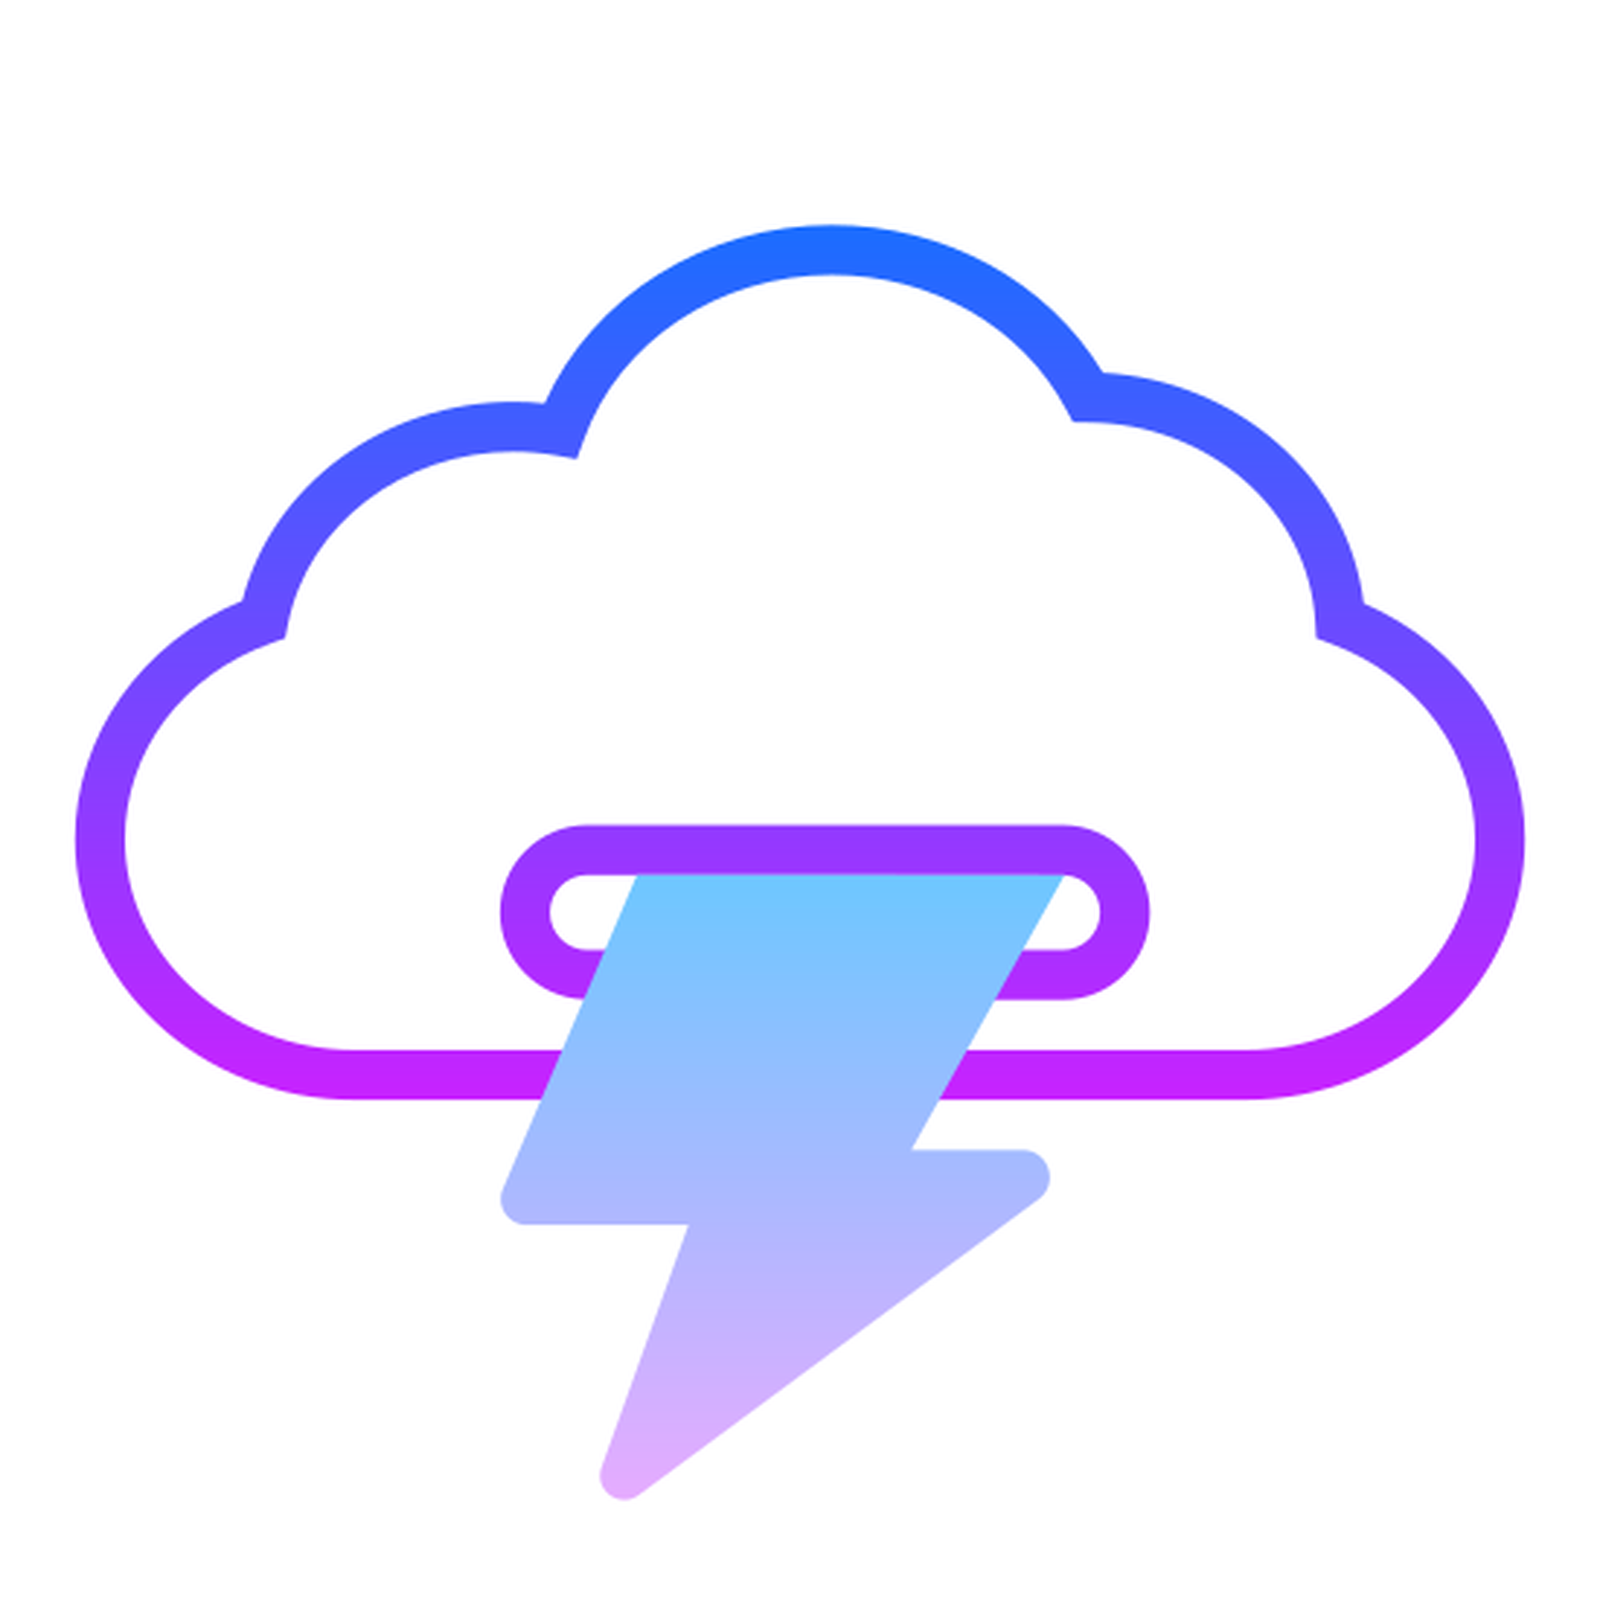 Cloudshot icon